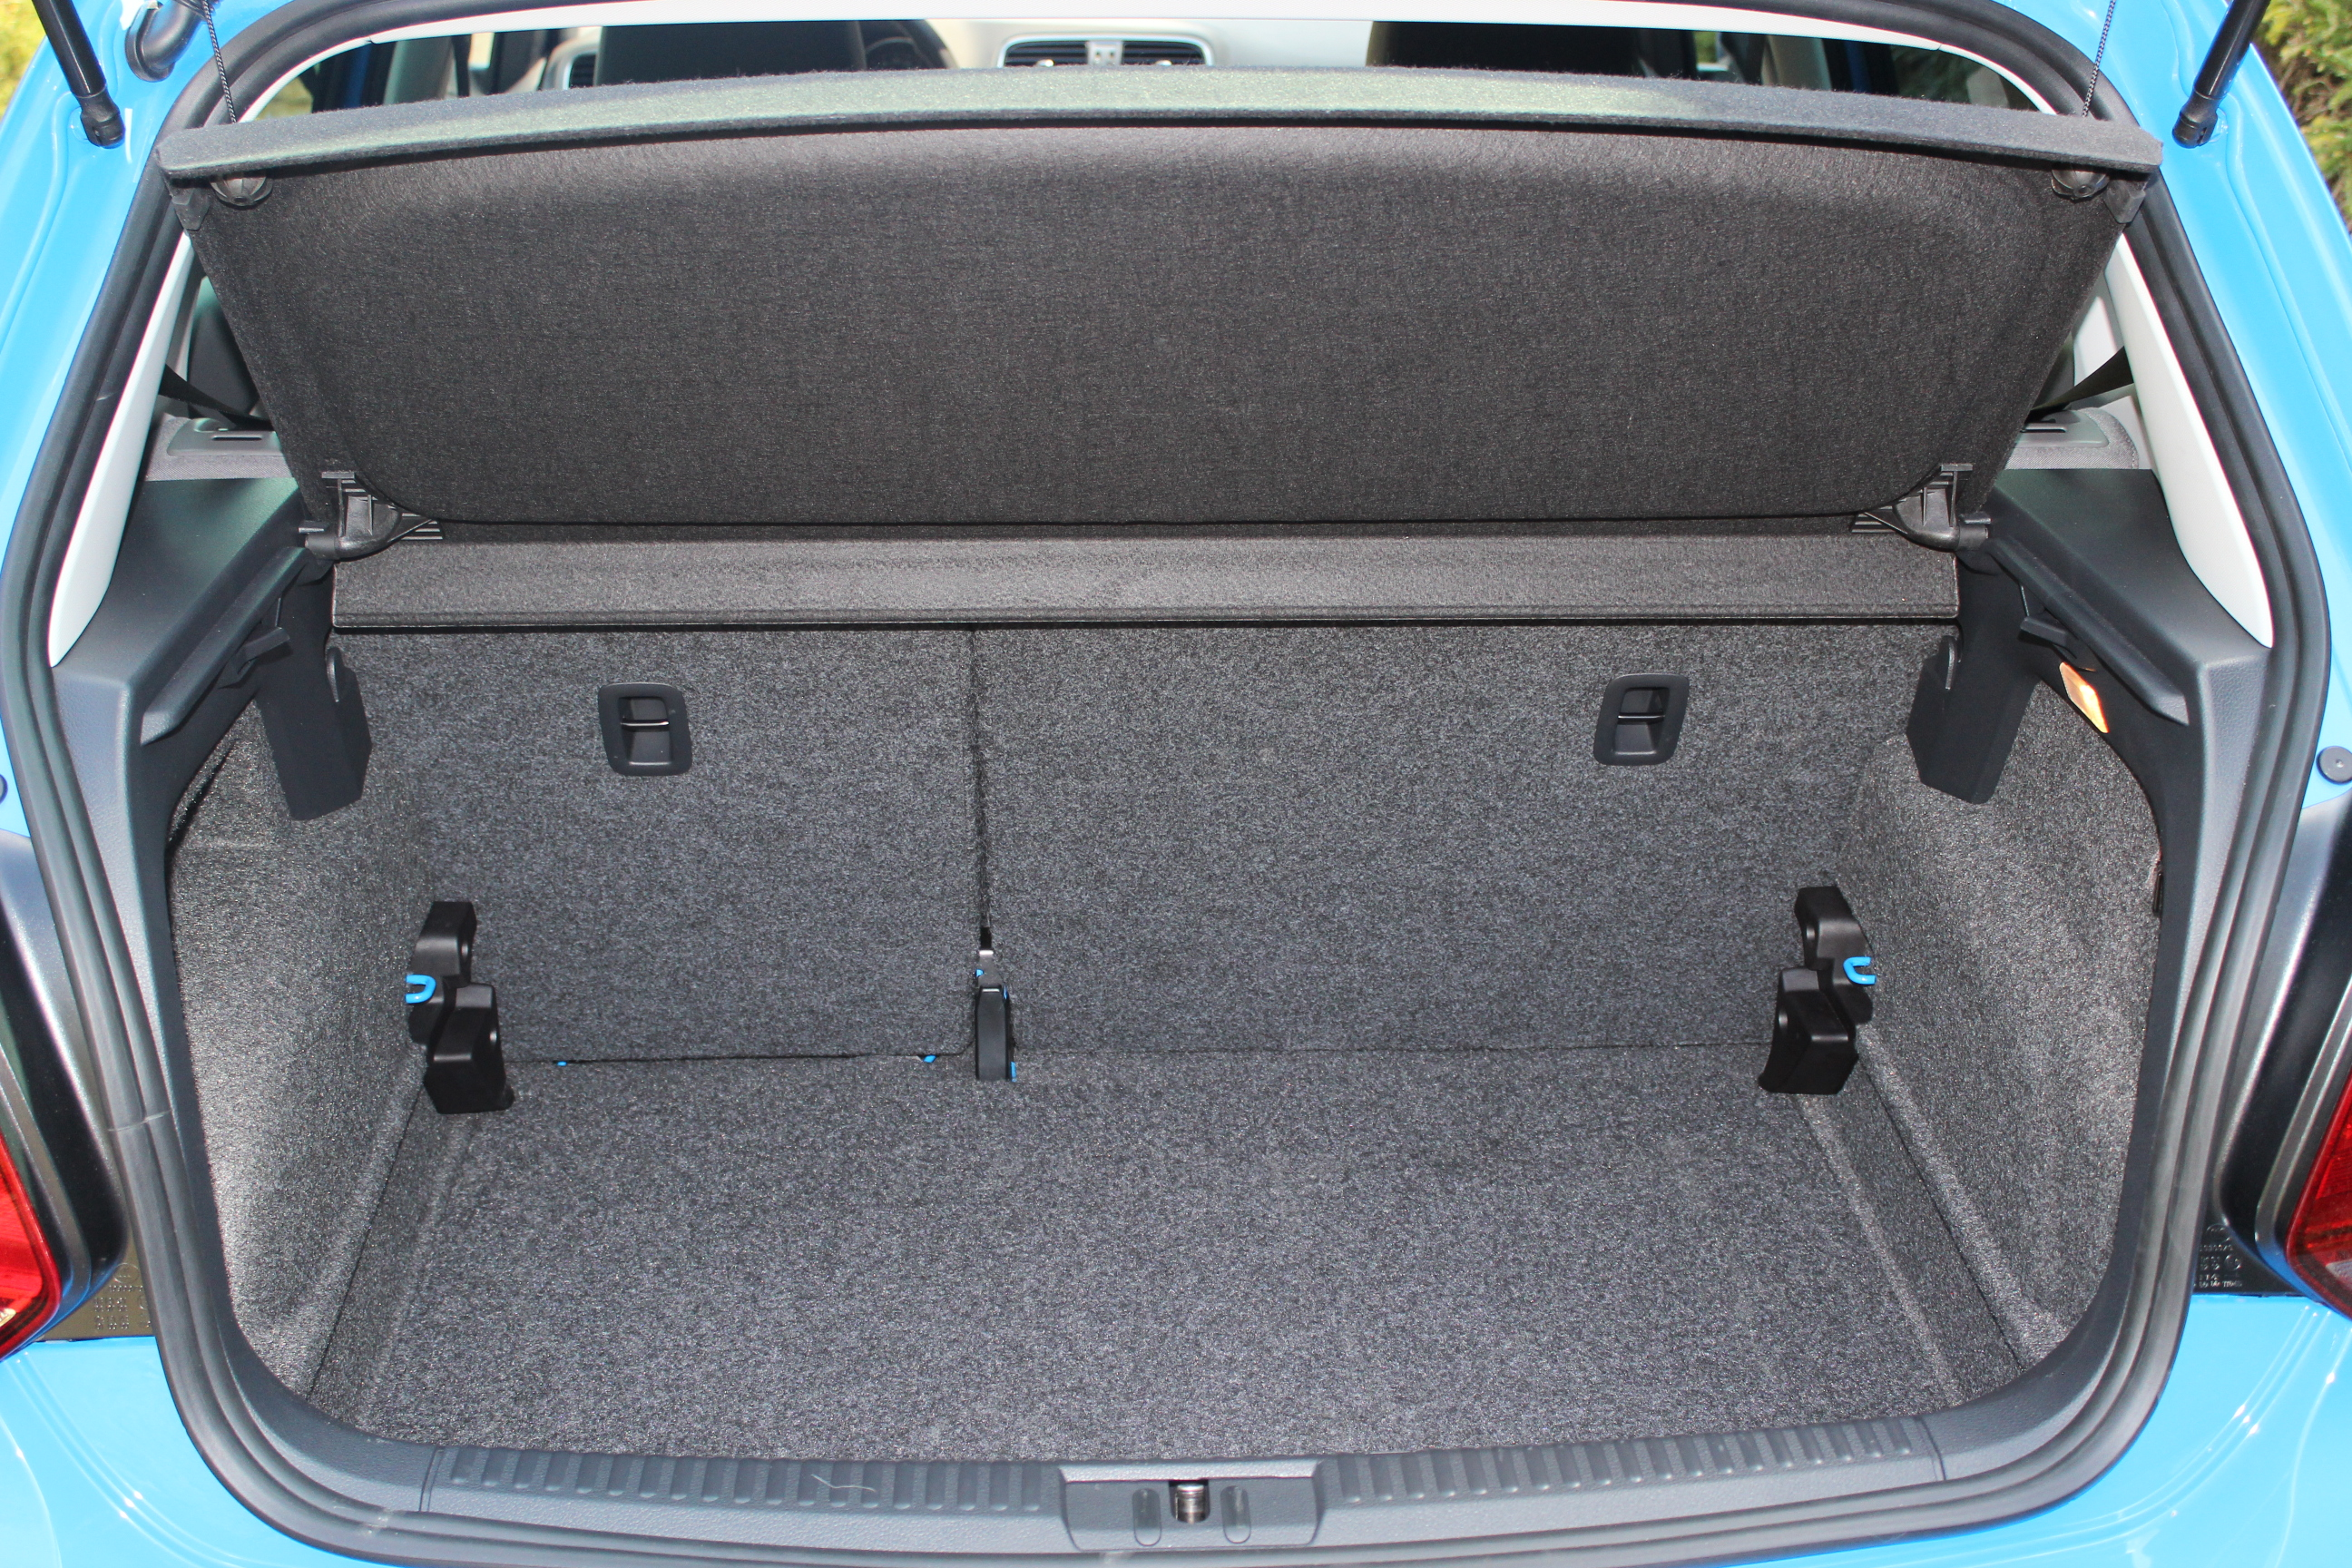 Essai Vid 233 O Volkswagen Polo Restyl 233 E De Vrais